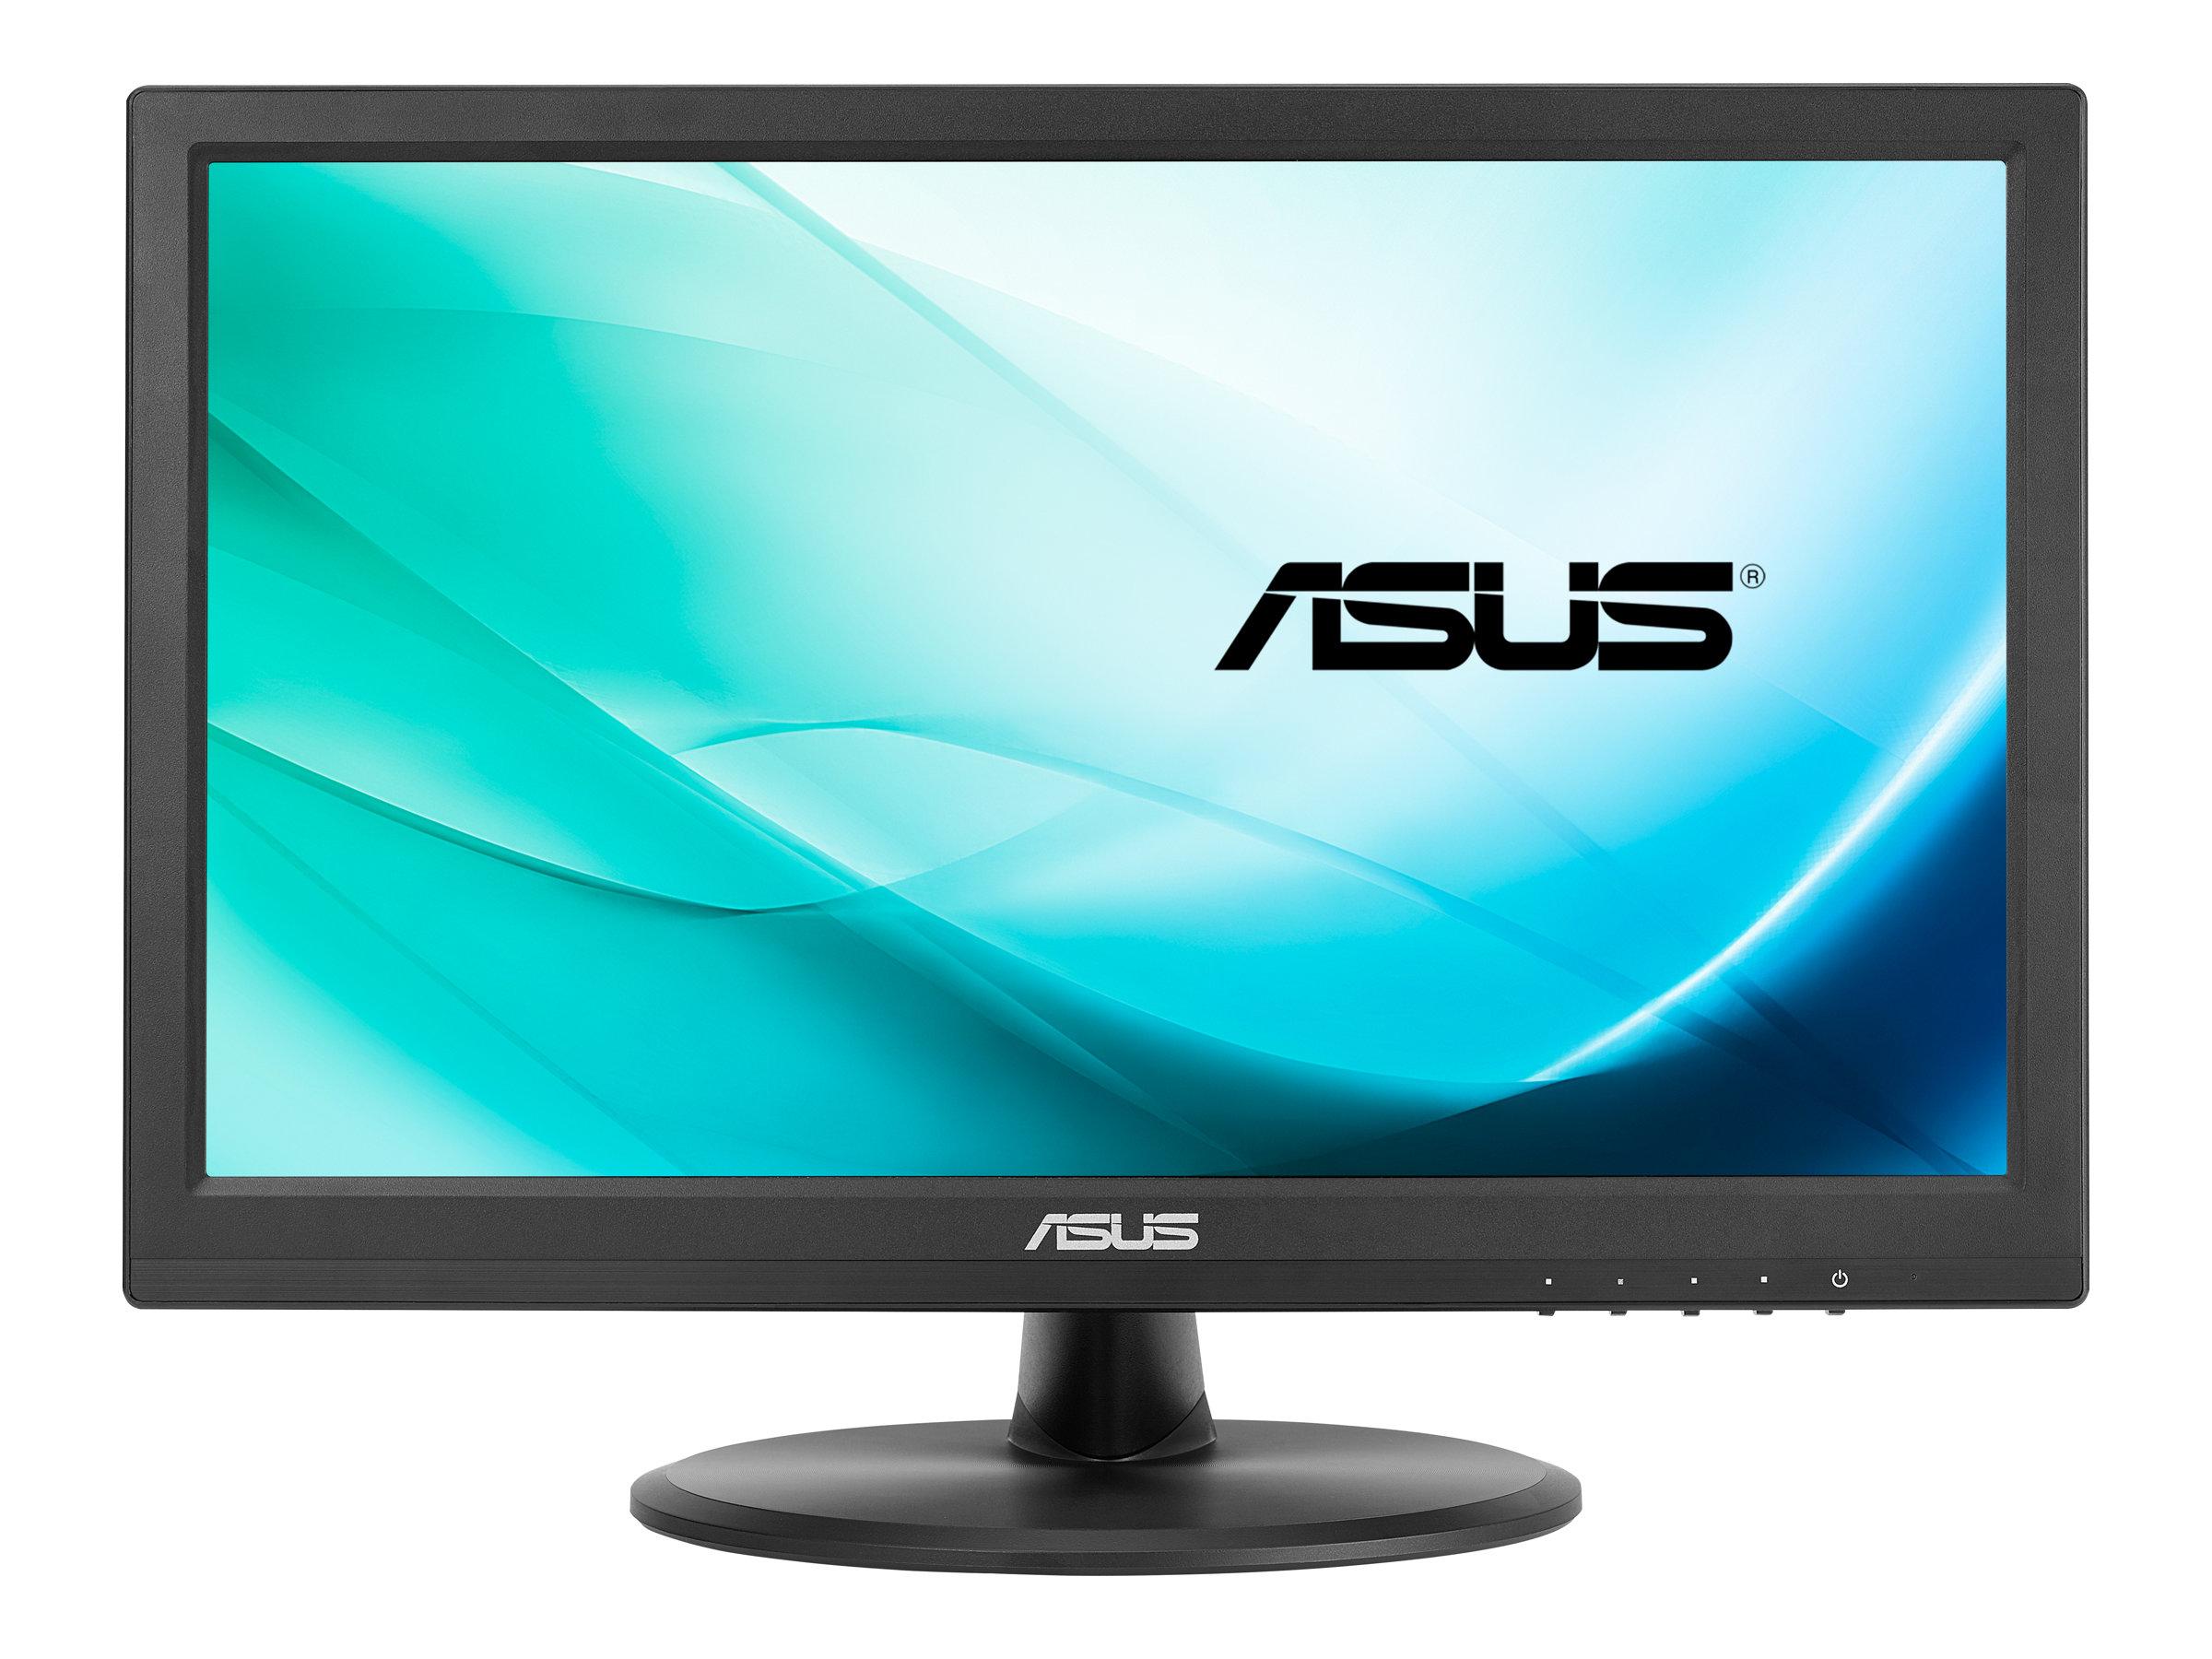 ASUS VT168H - LED-Monitor - 39.6 cm (15.6